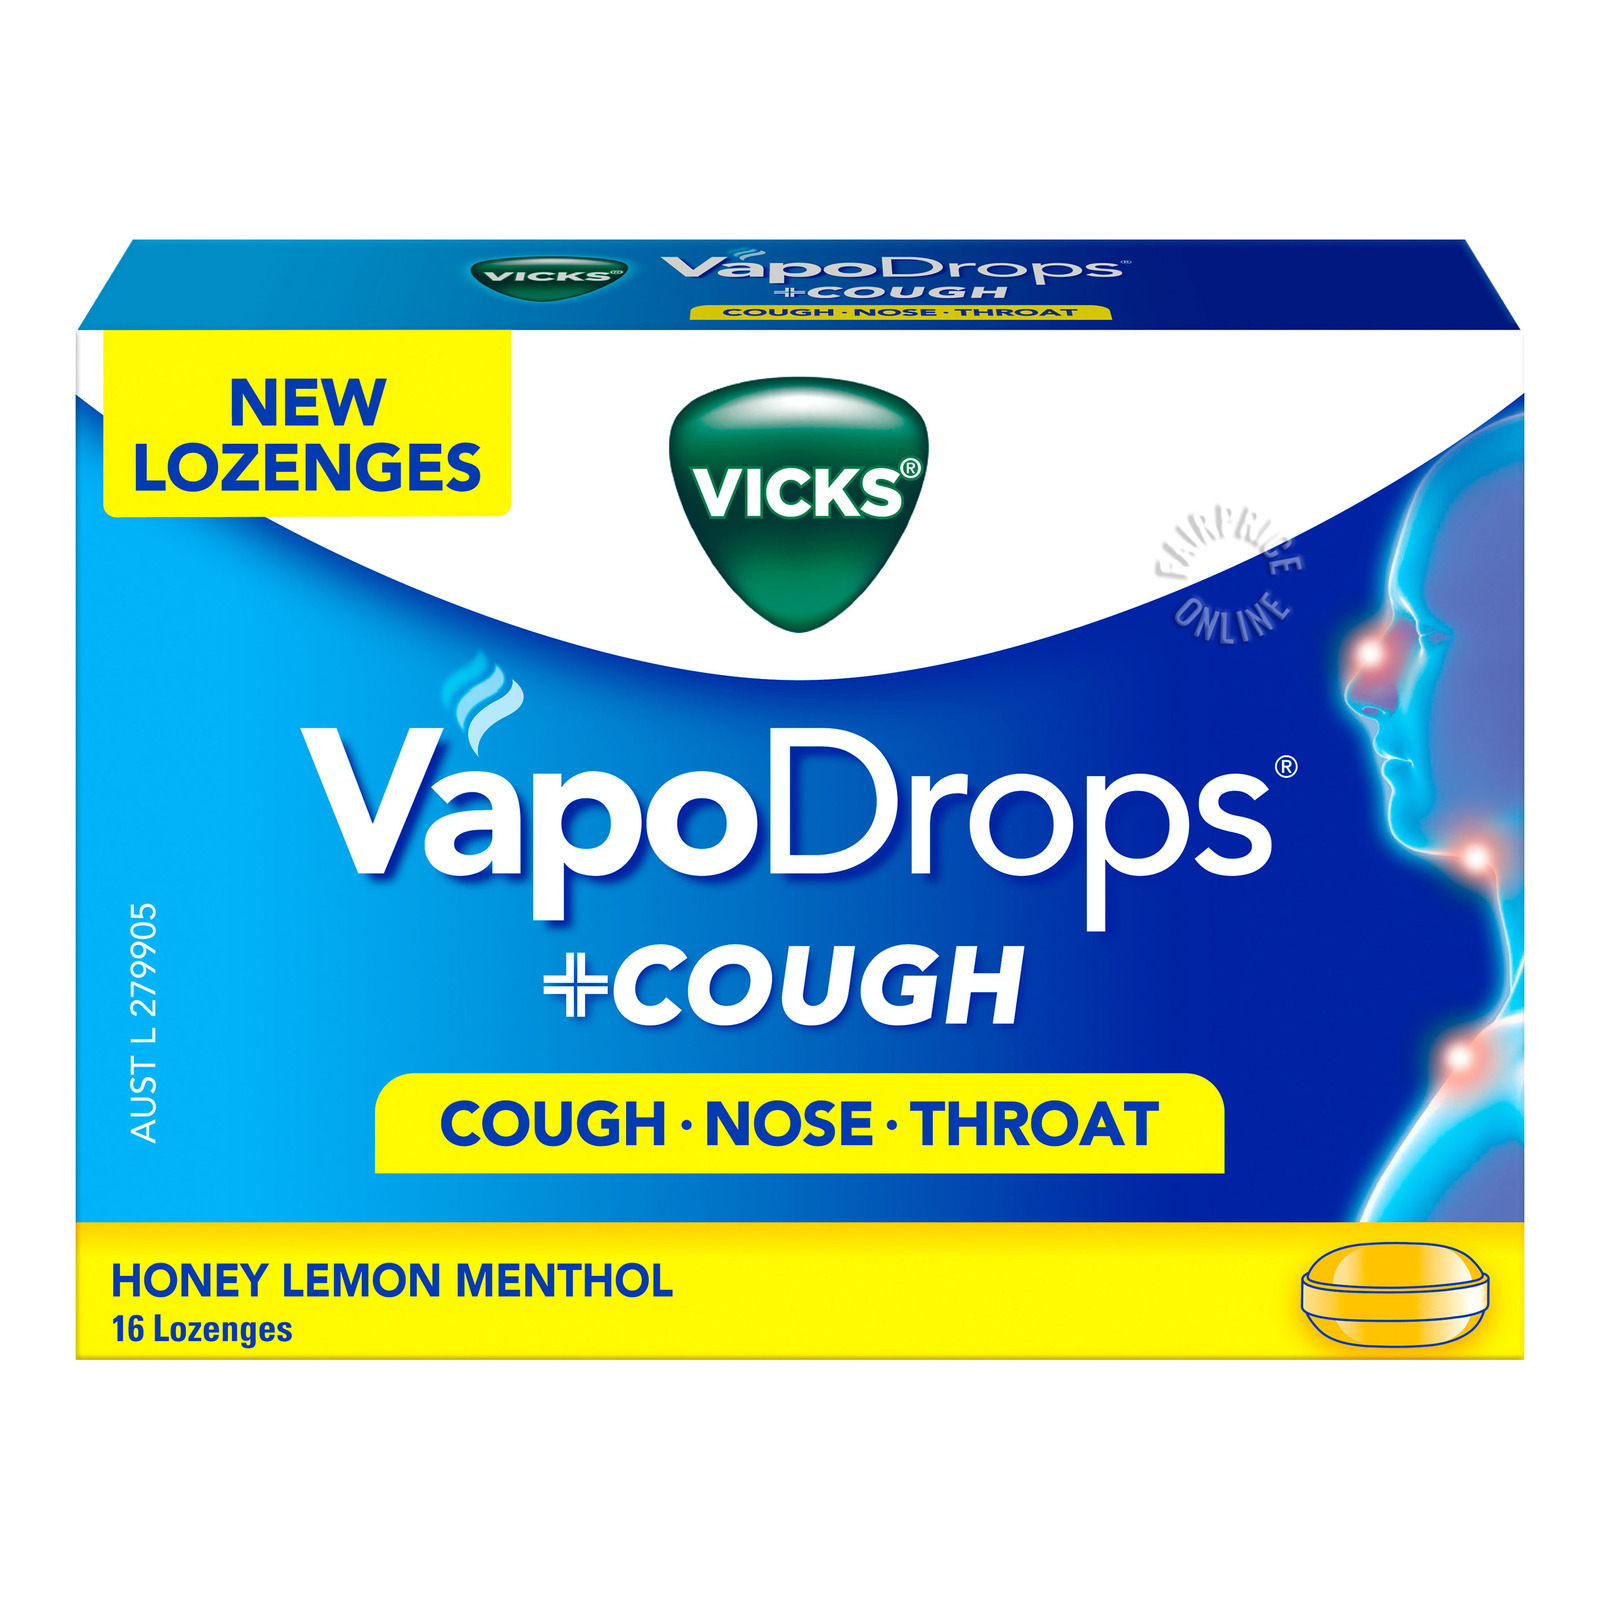 Vicks VapoDrops + Cough Menthol Lozenges - Honey Lemon